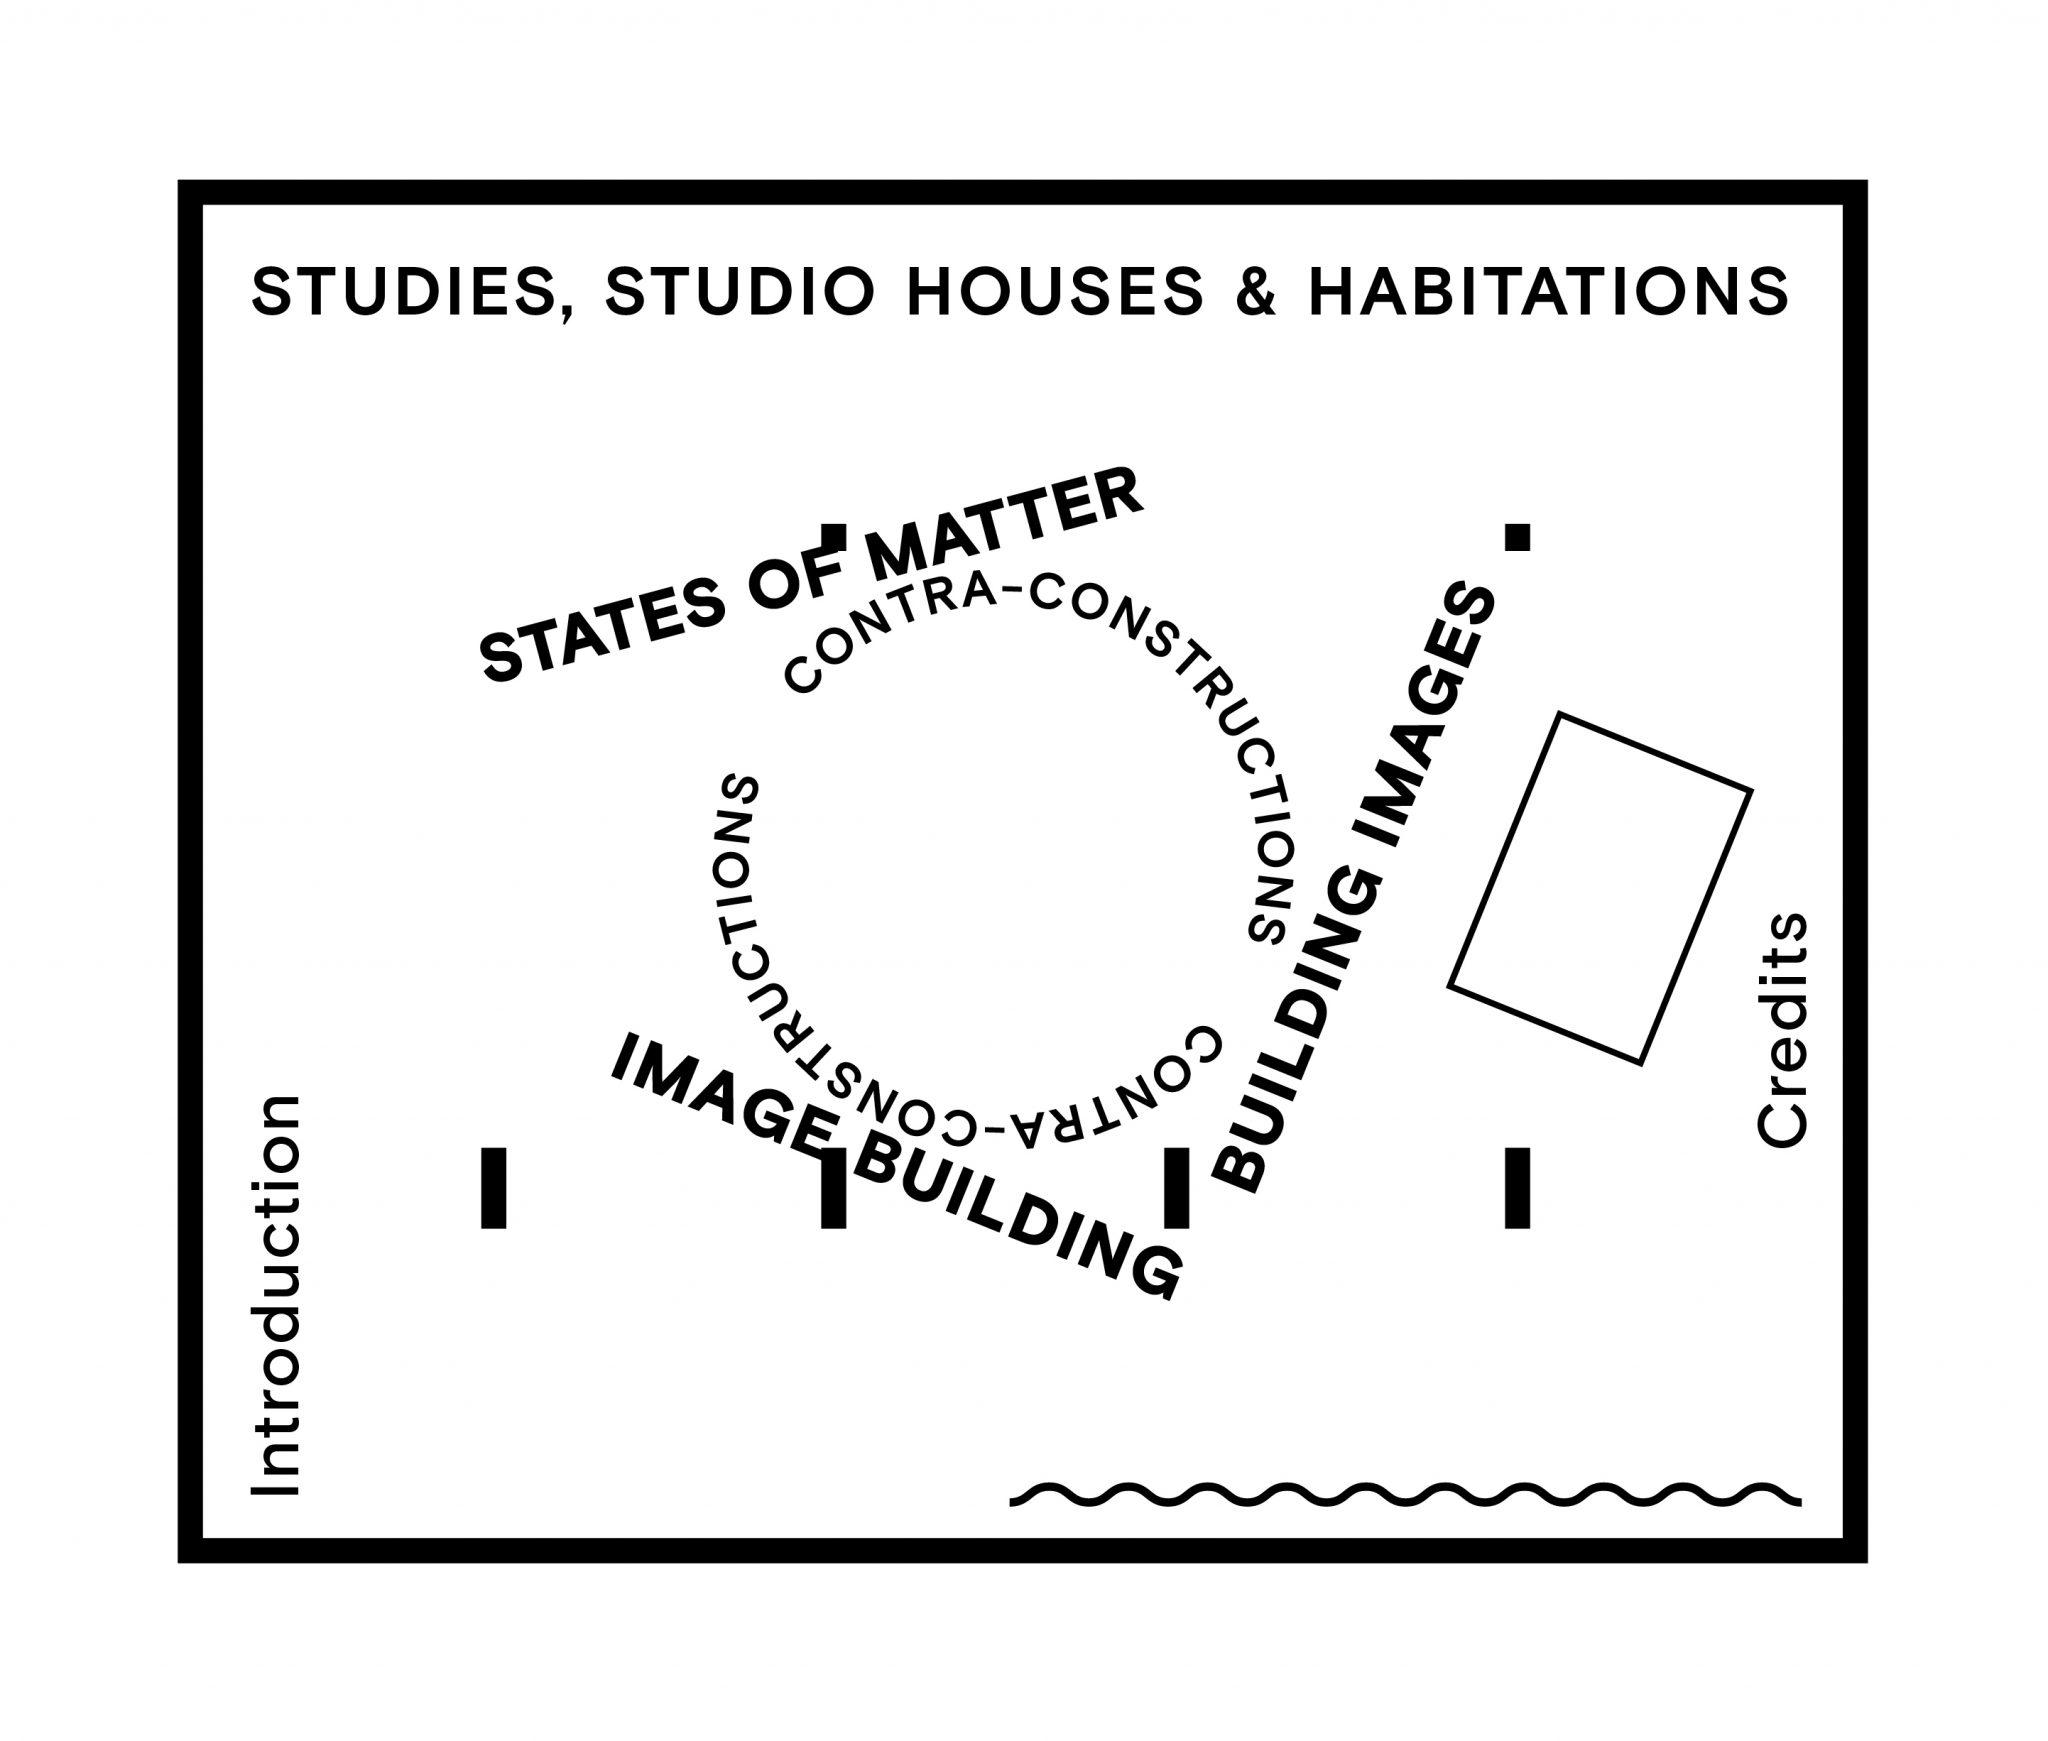 Floorplan Atelier Nelly & Theo van Doesburg